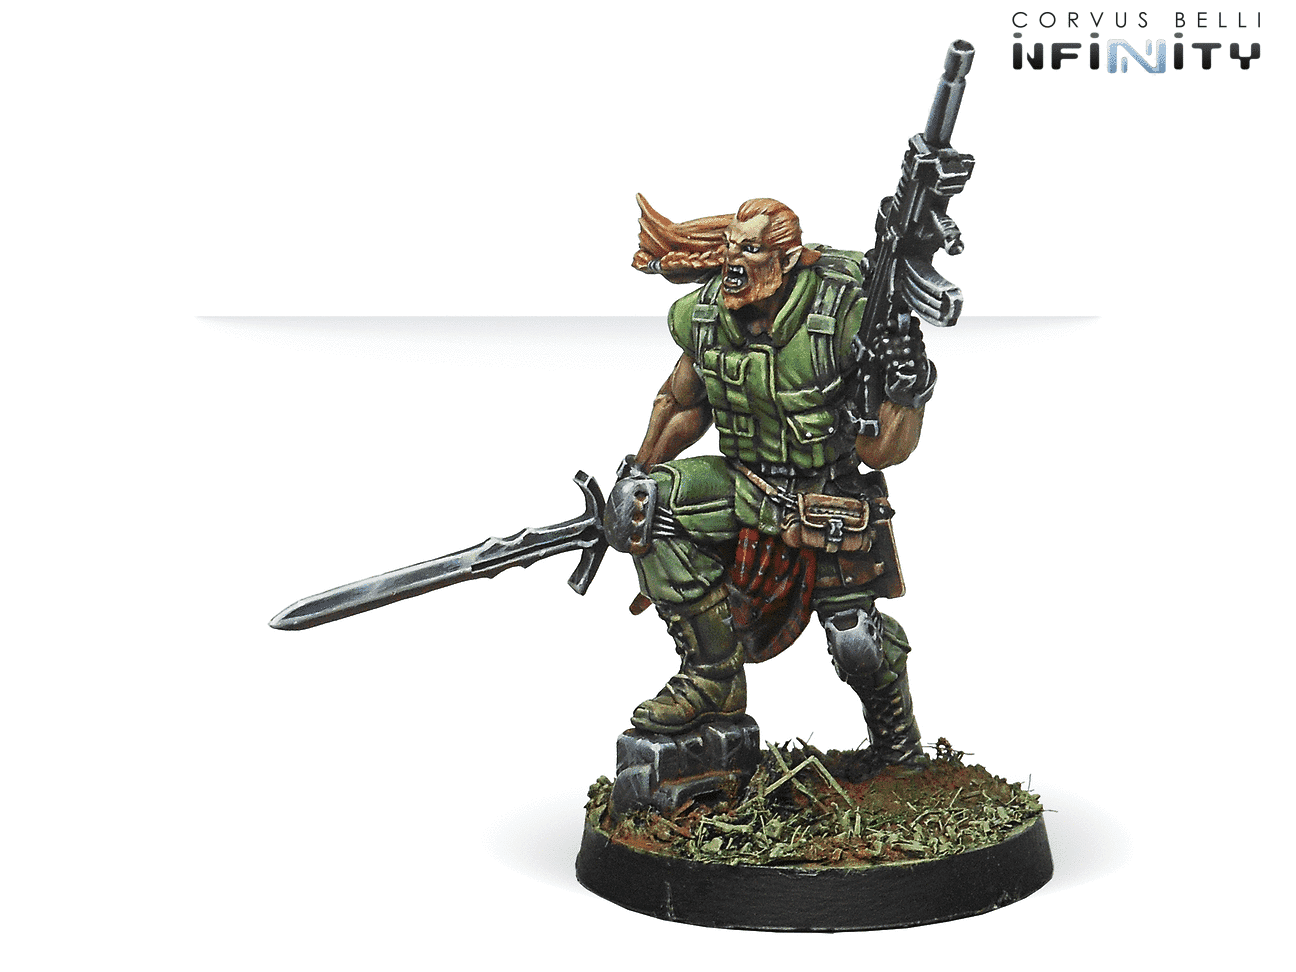 caledonian-highlander-army-ariadna-secto